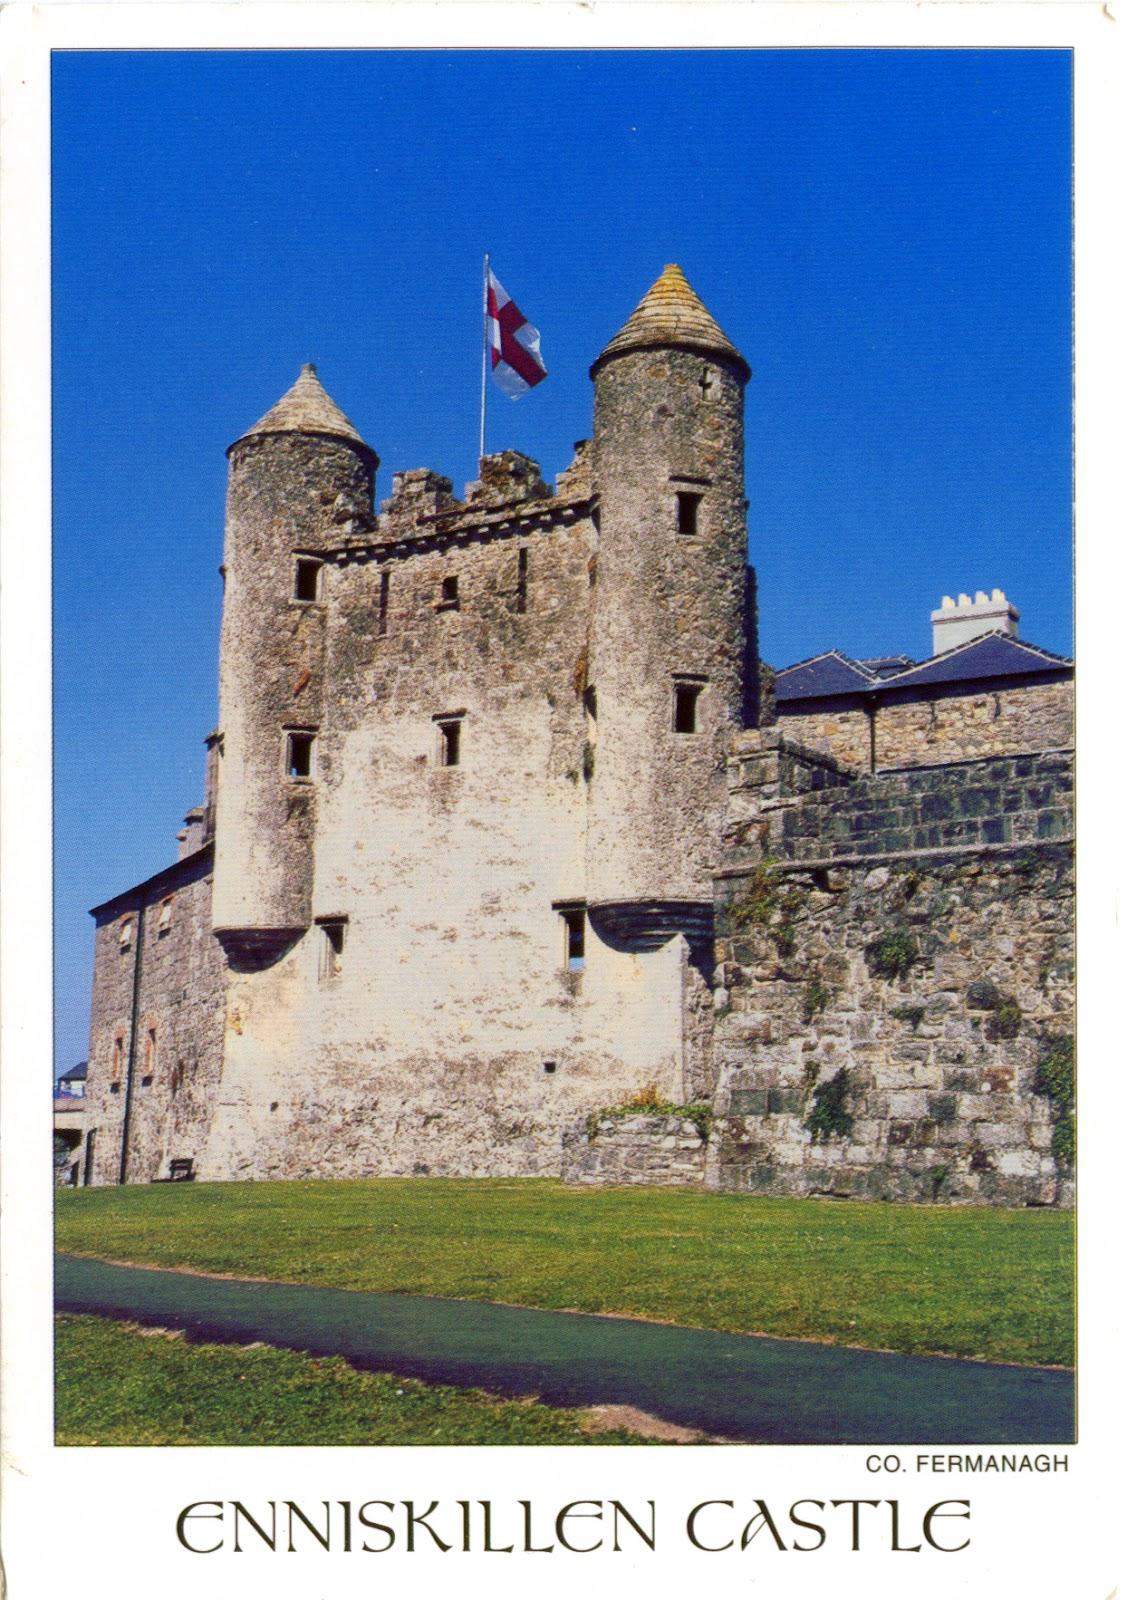 Enniskillen United Kingdom  city photos : 0106 UNITED KINGDOM Northern Ireland Ulster / Ulaidh – The ...